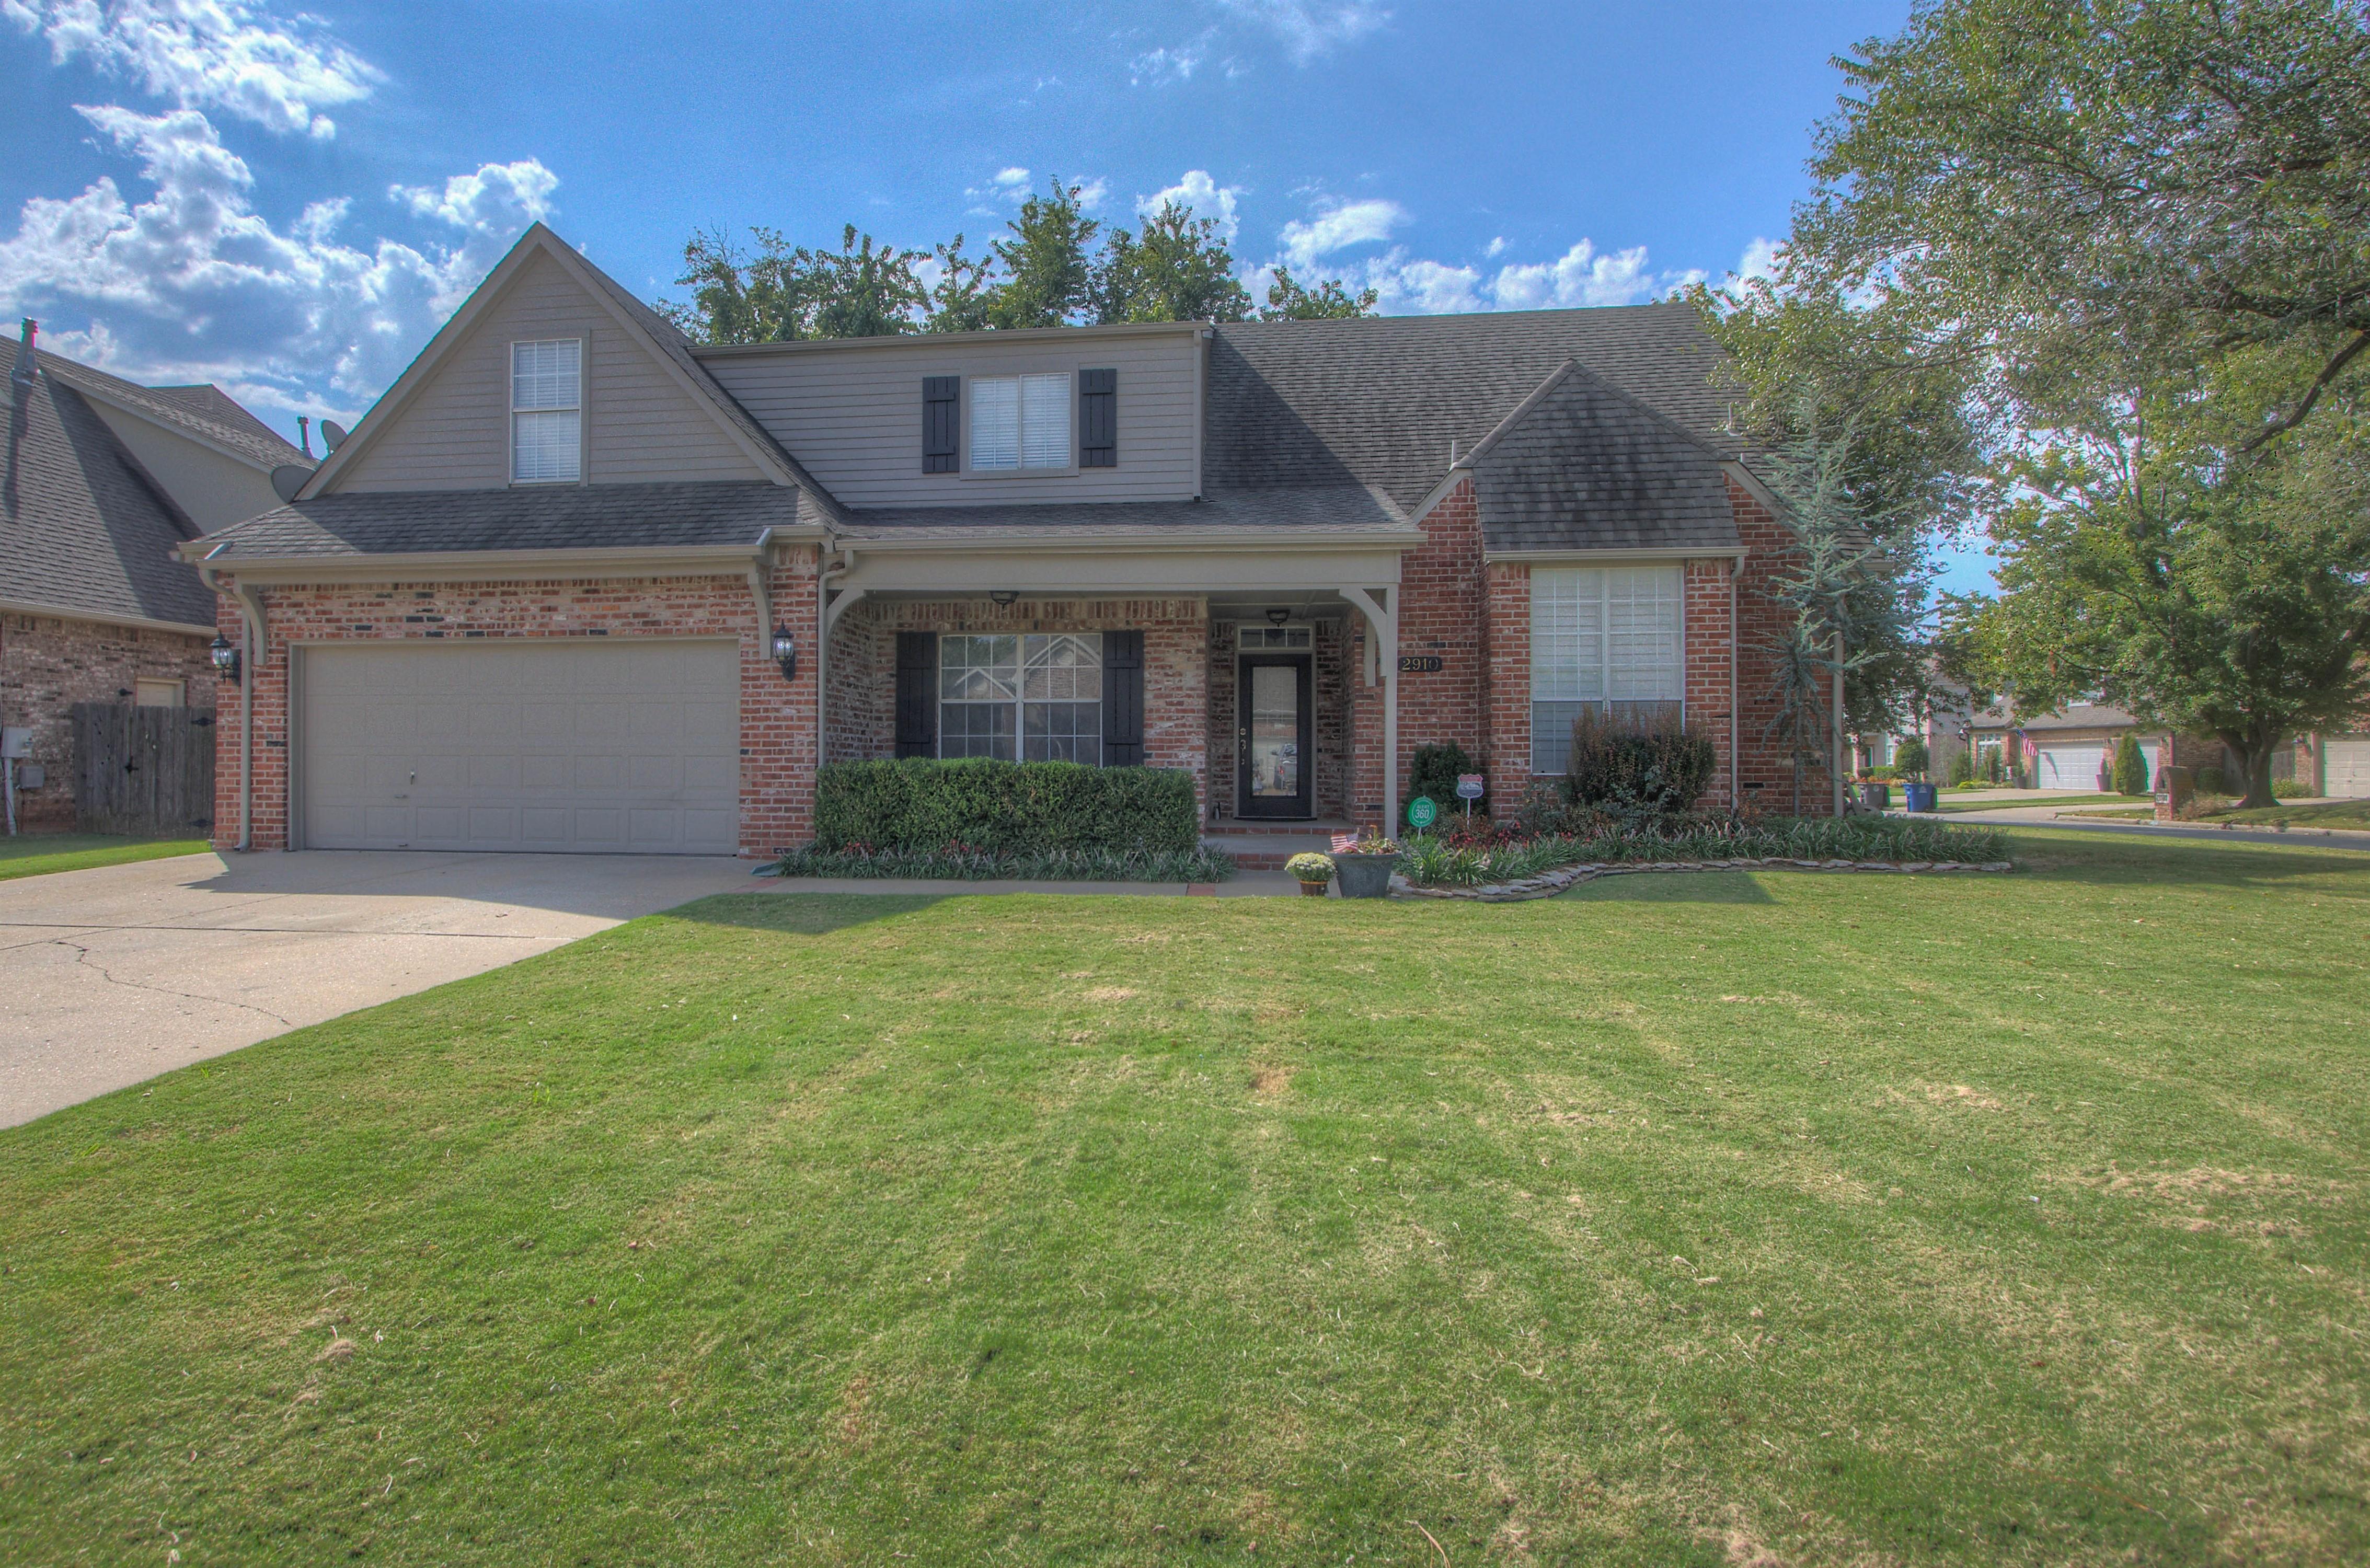 2910 E 101st Place Property Photo 1